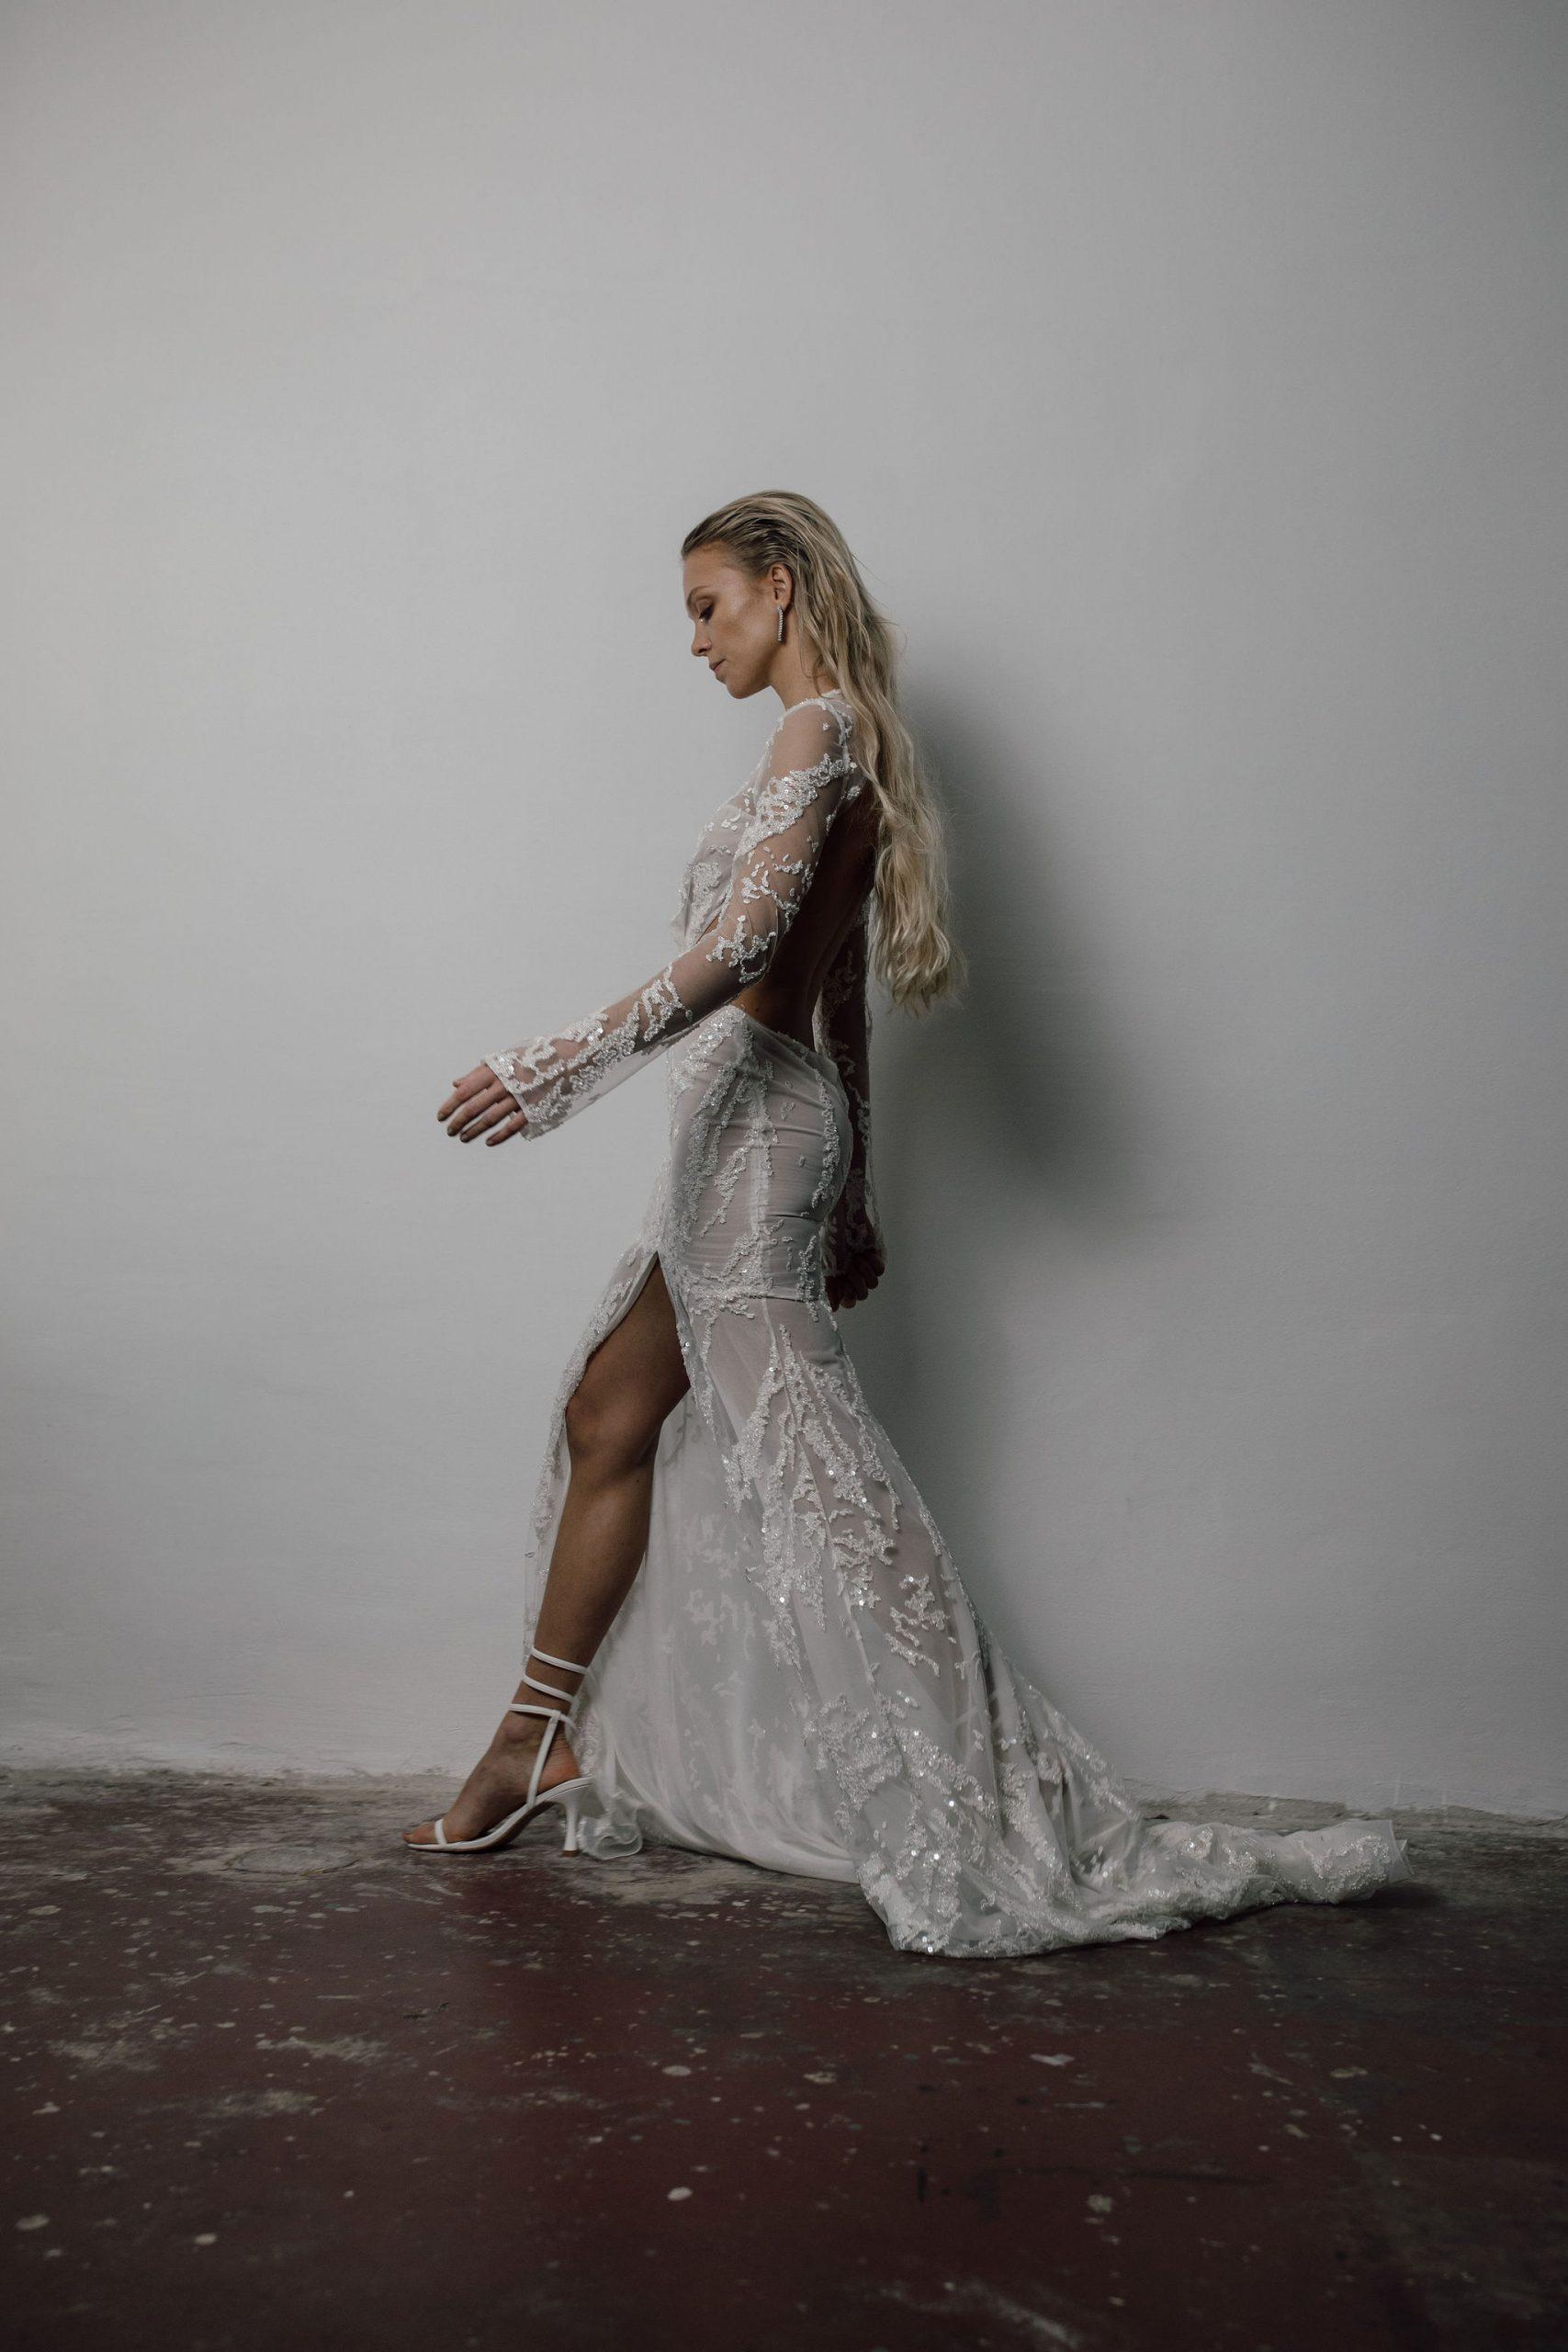 Vestidos de novia Ritual Unions, vestidos de novia 2021, tendencias en vestidos de novia 2021, Blank Collection - Wedding Hub - 020